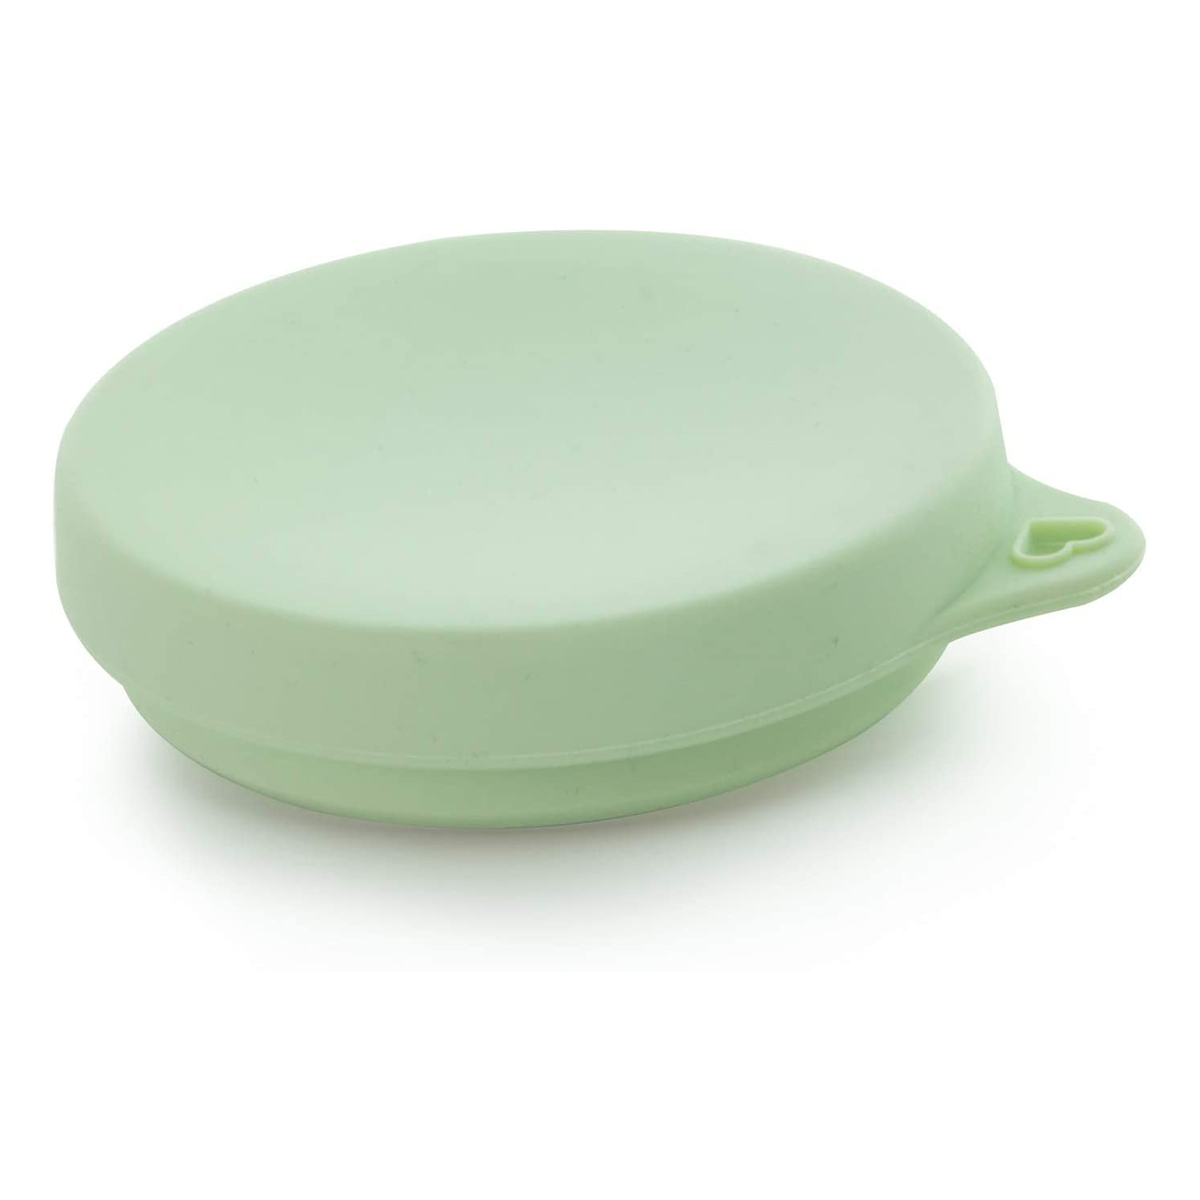 Copo de silicone retrátil com tampa 160ml Mimo Style